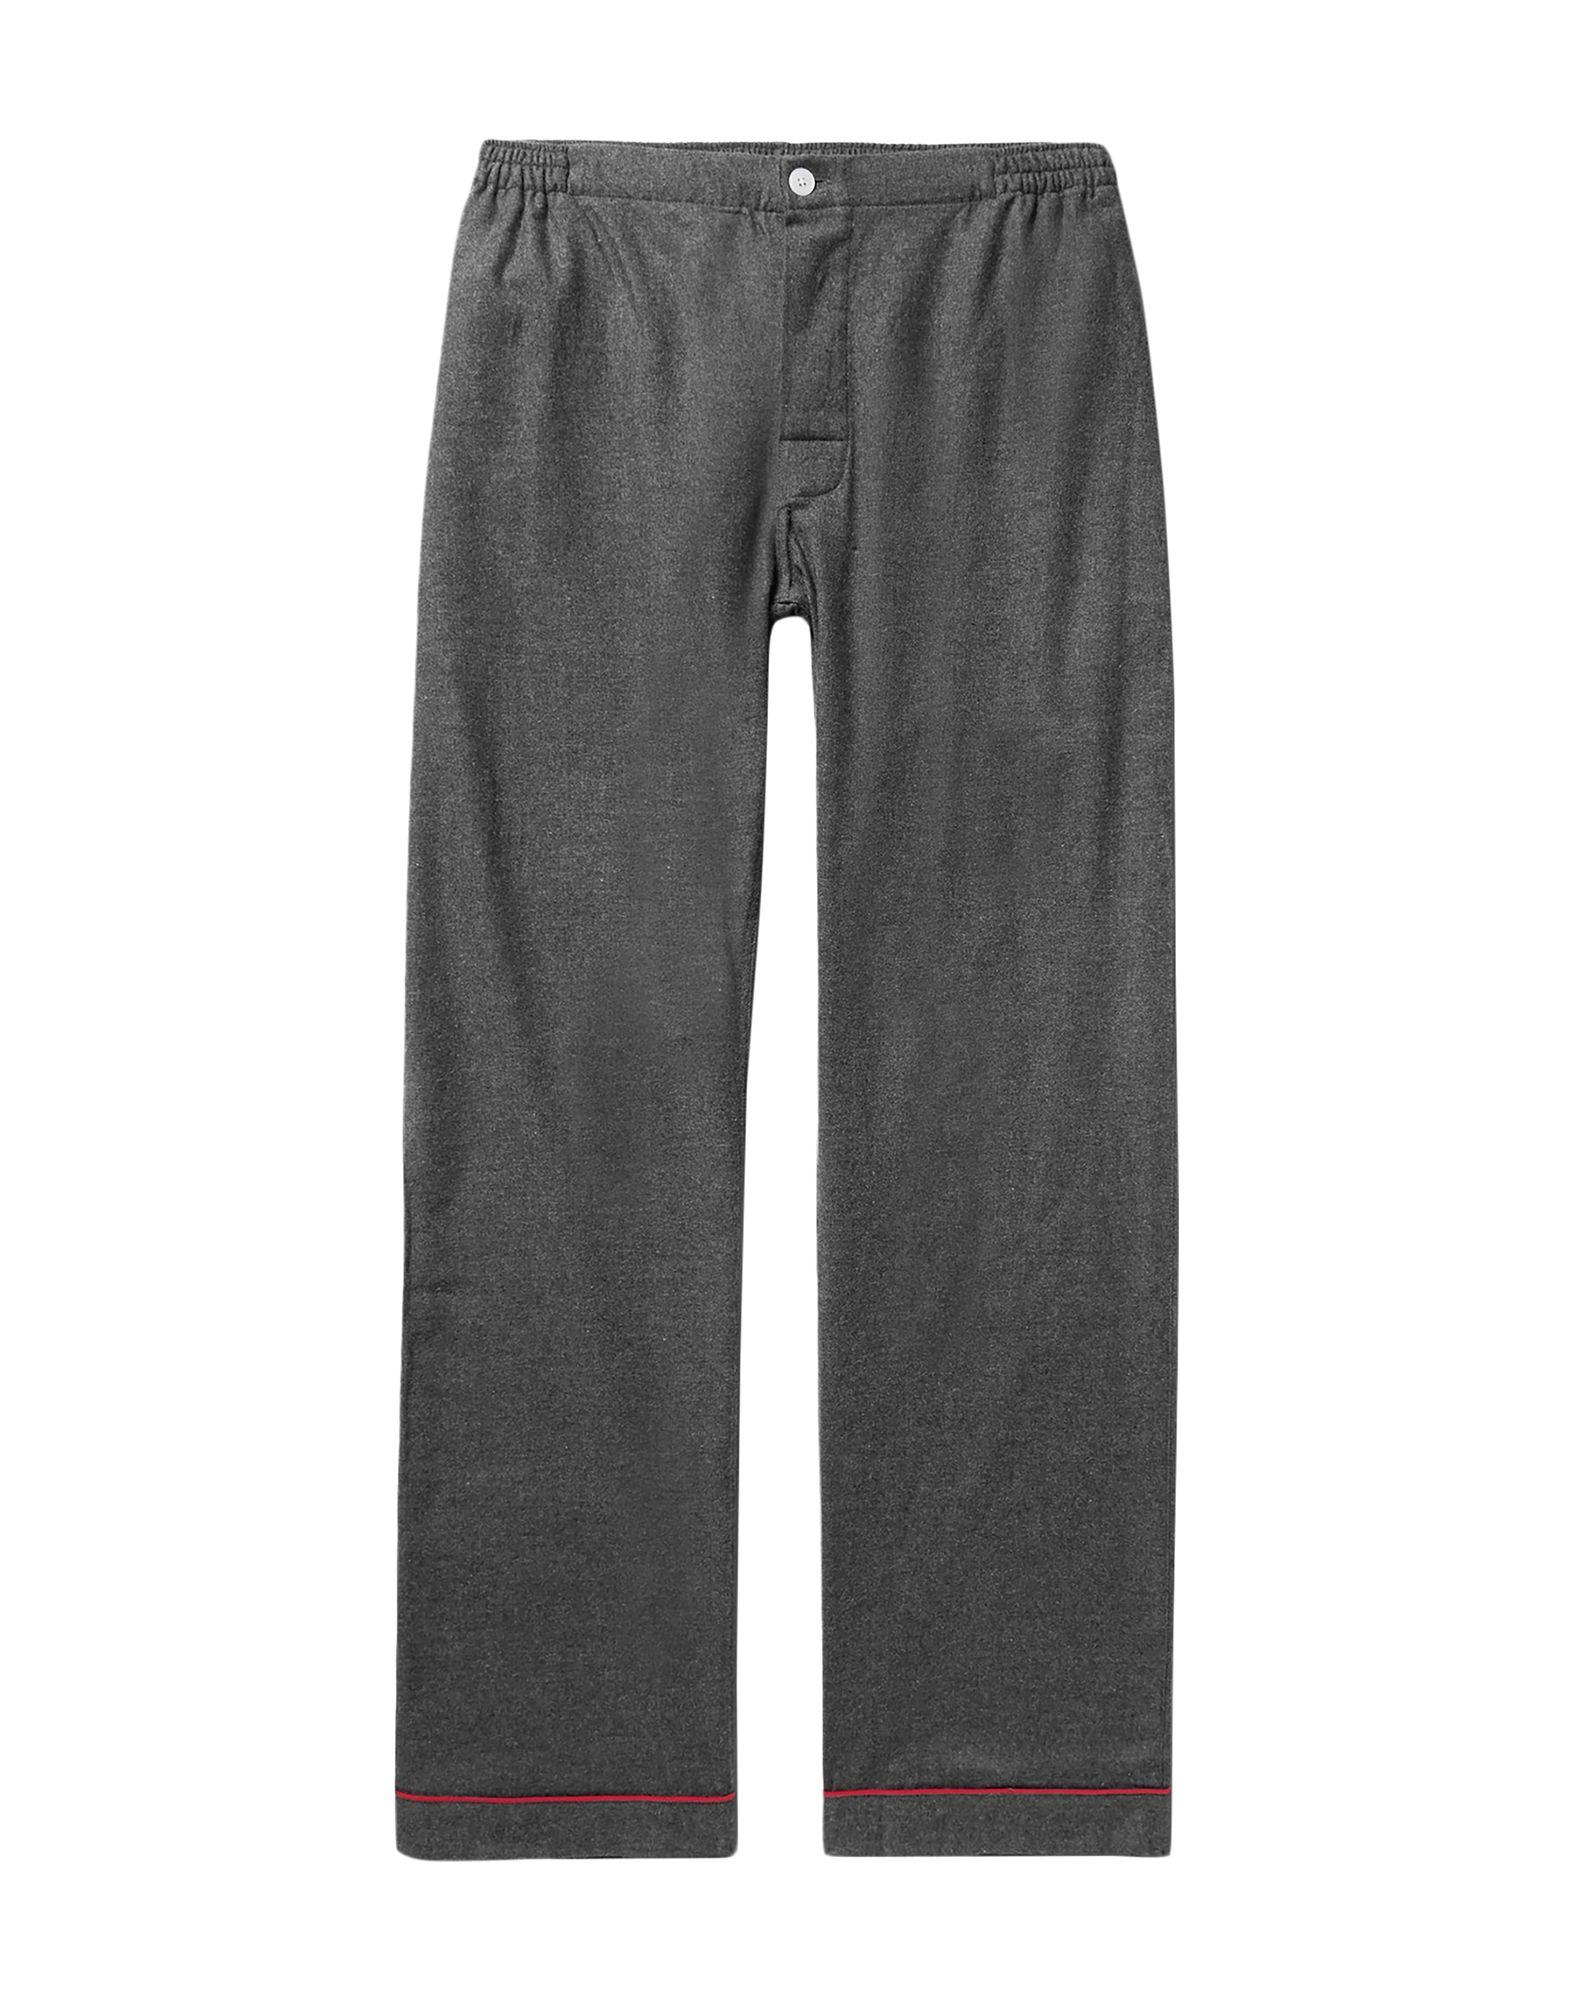 SLEEPY JONES Пижама пижамные комплекты